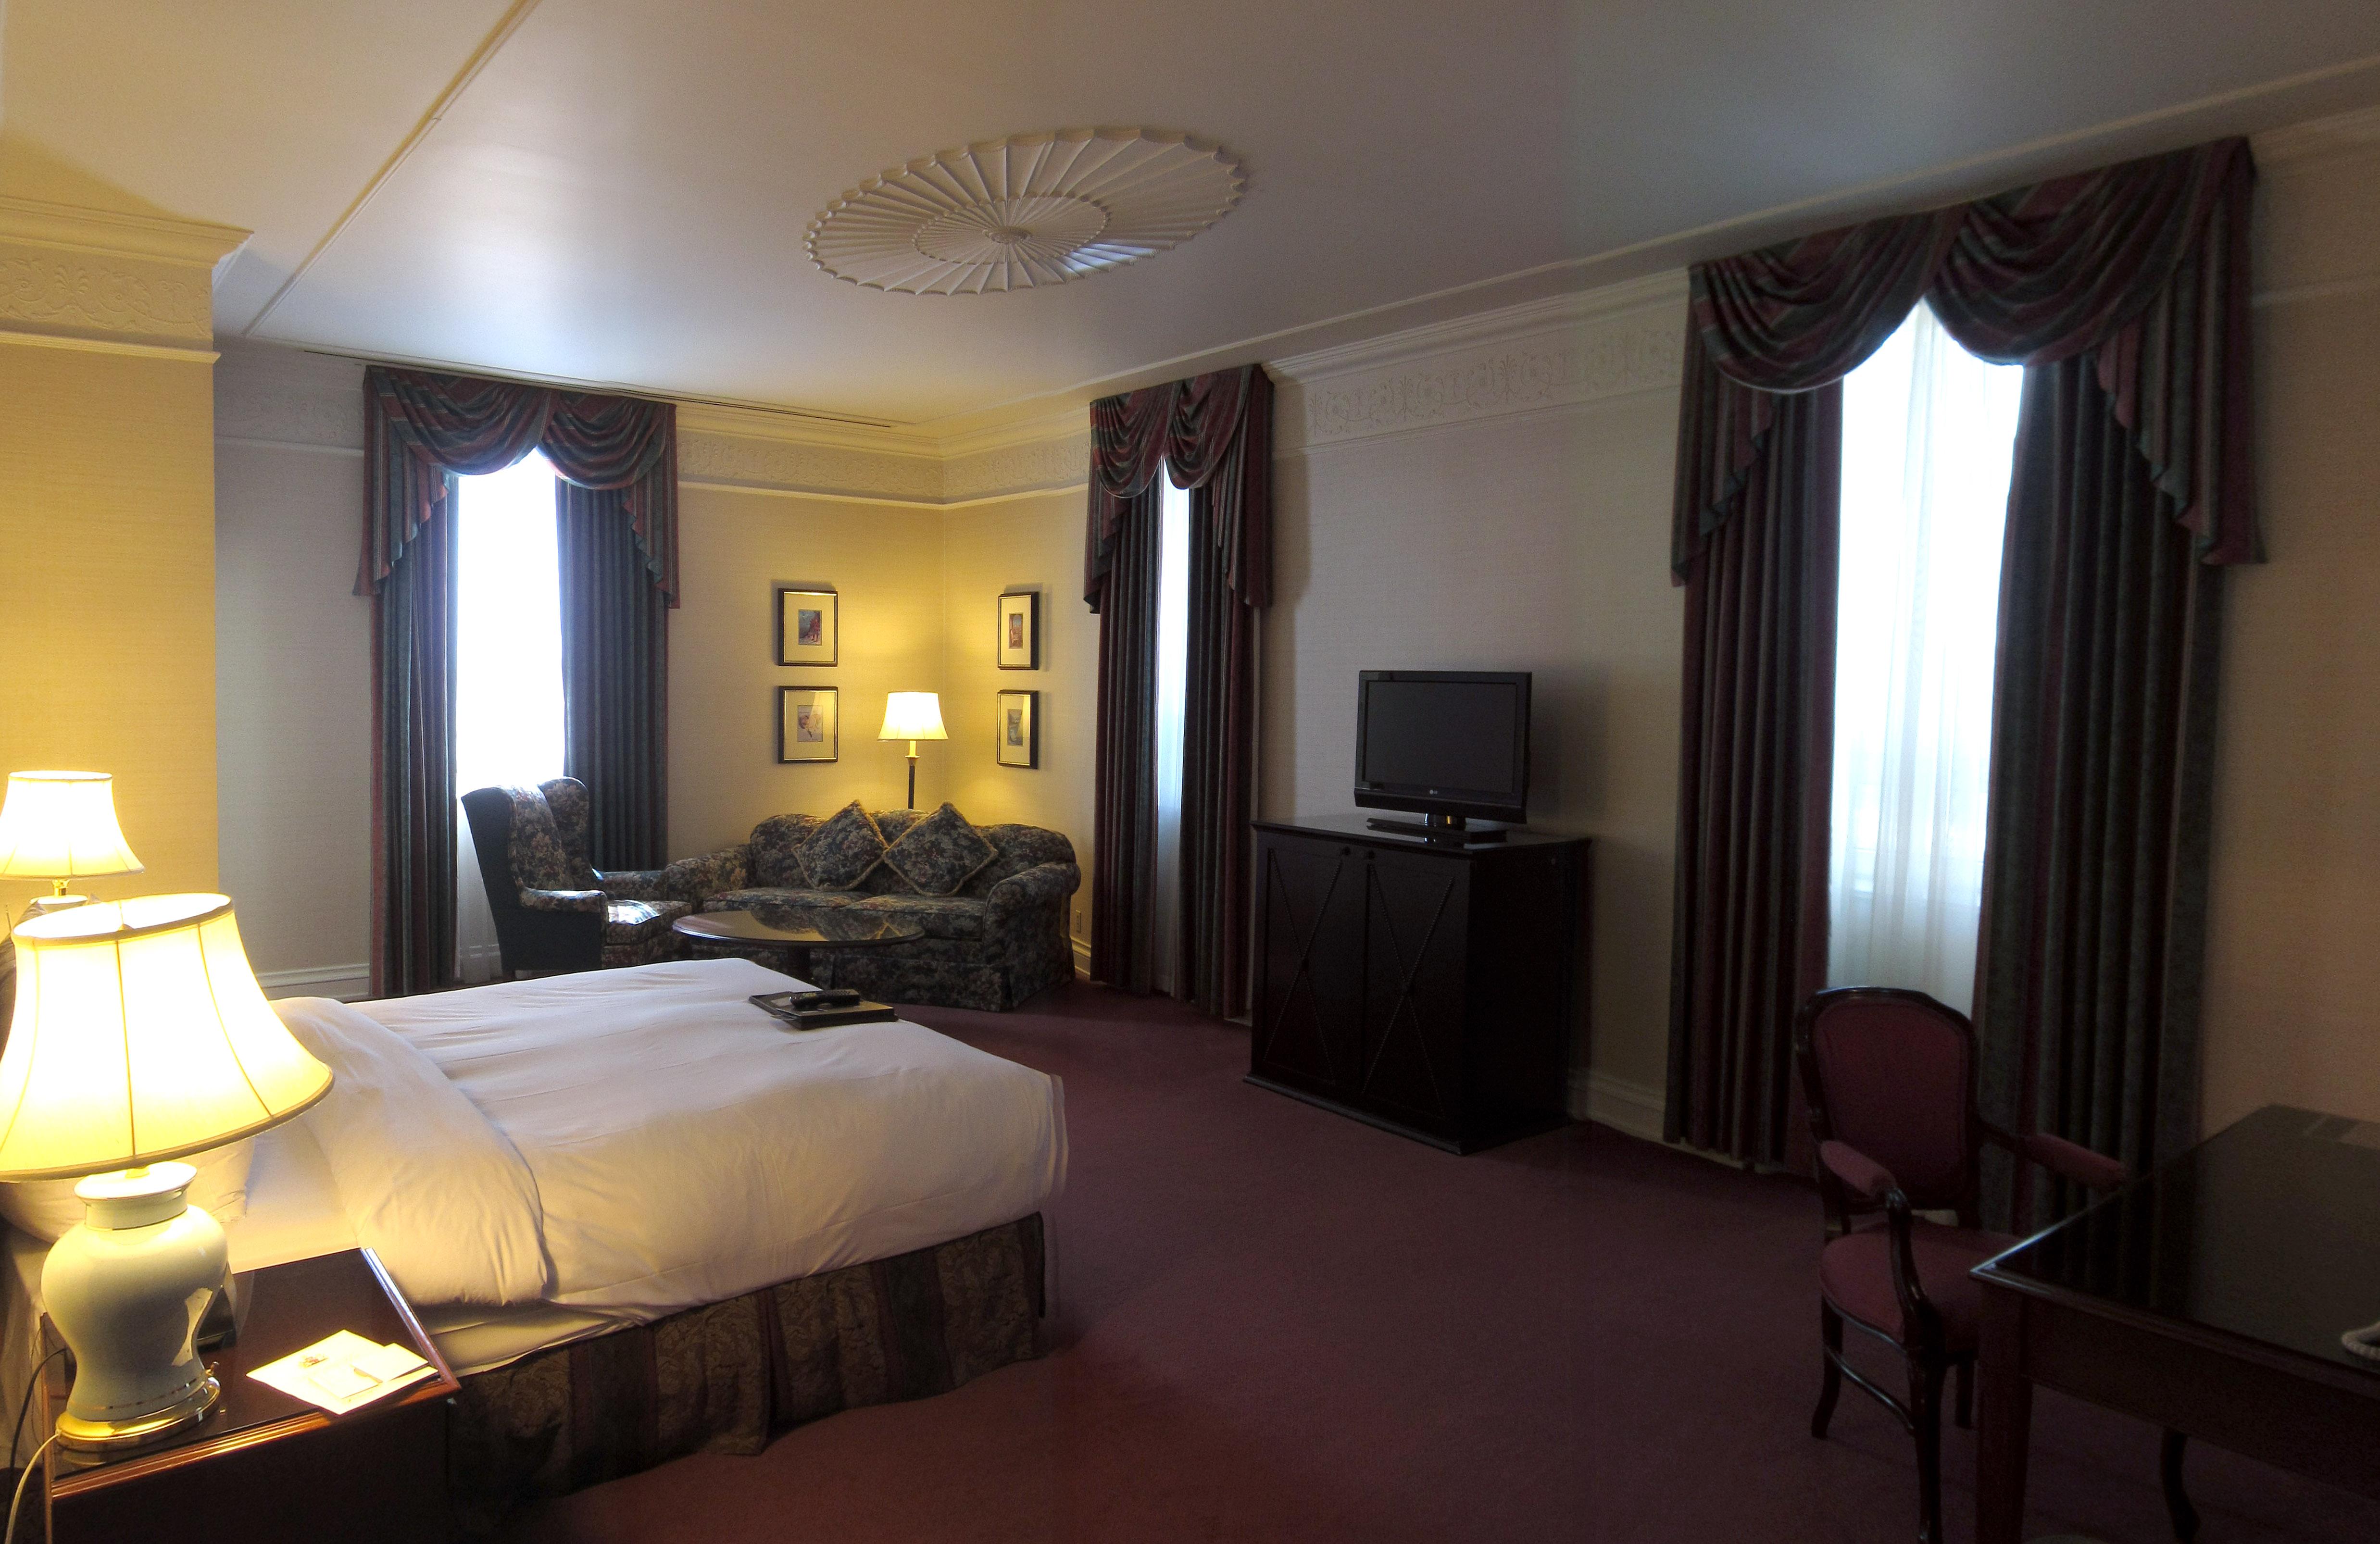 Fairmont Banff Room Service Menu